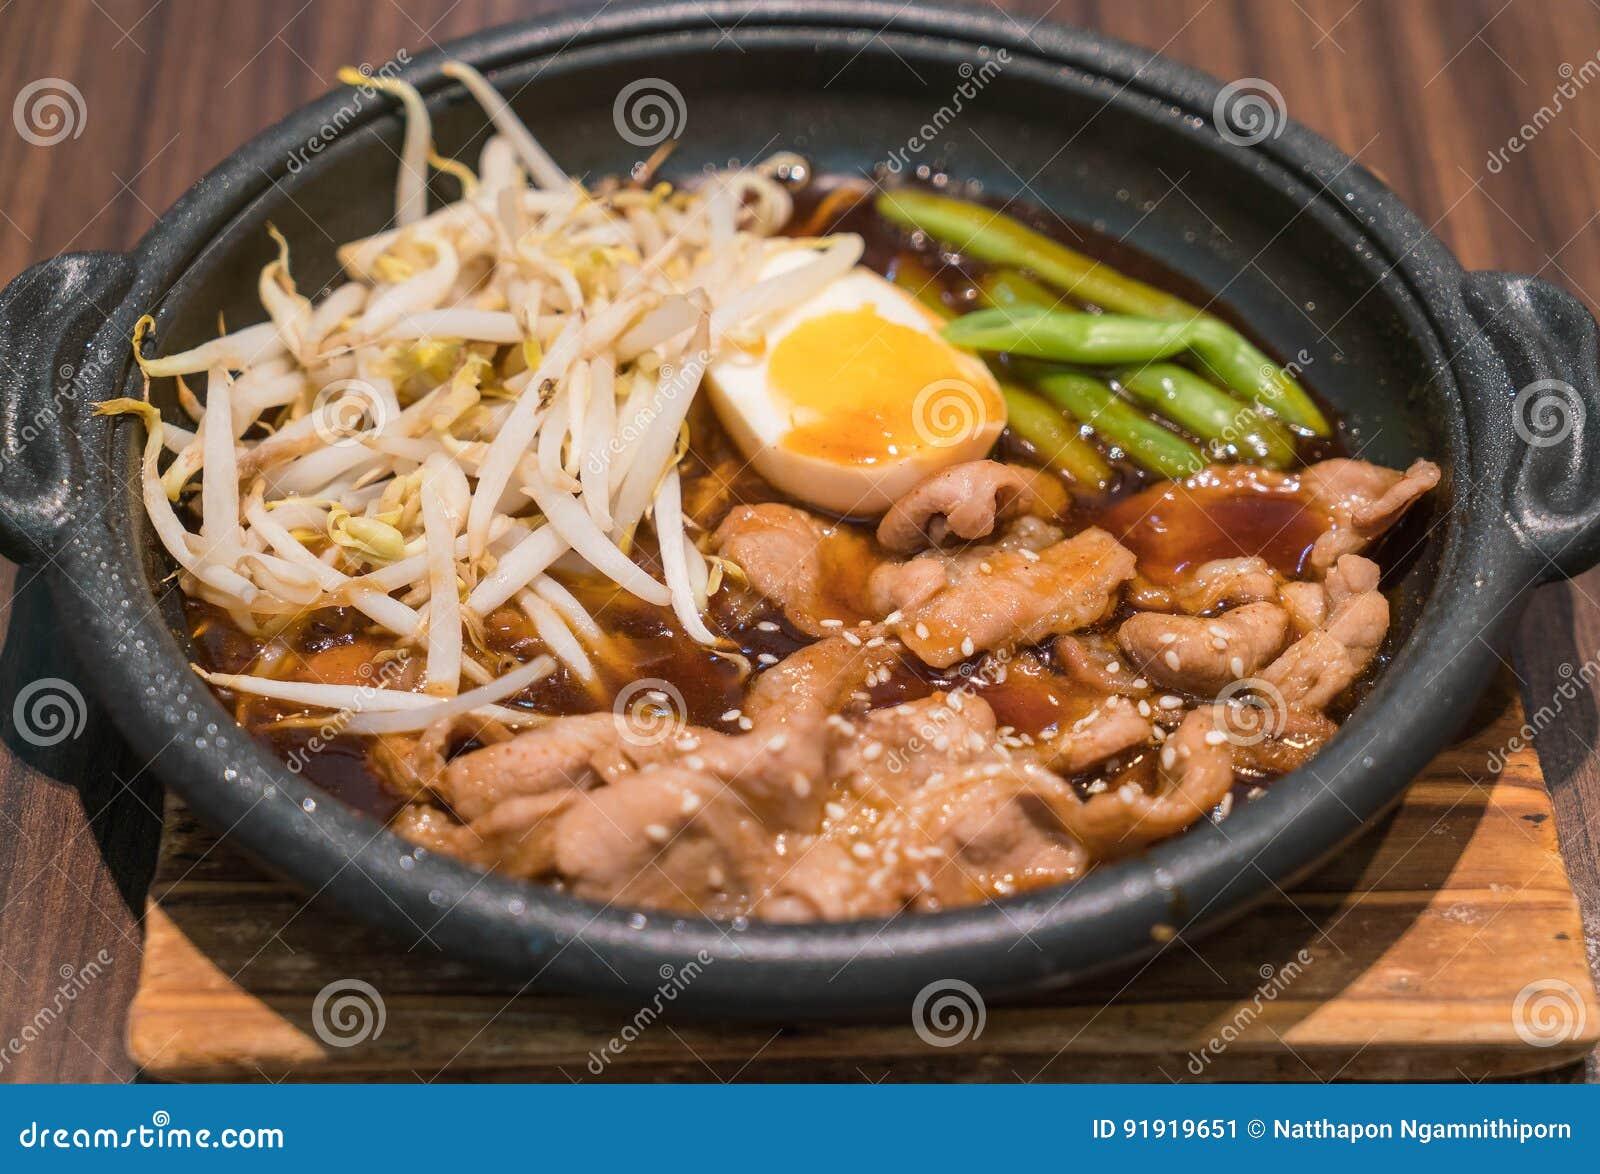 Bbq Dishes Hot Korean Plate Pork